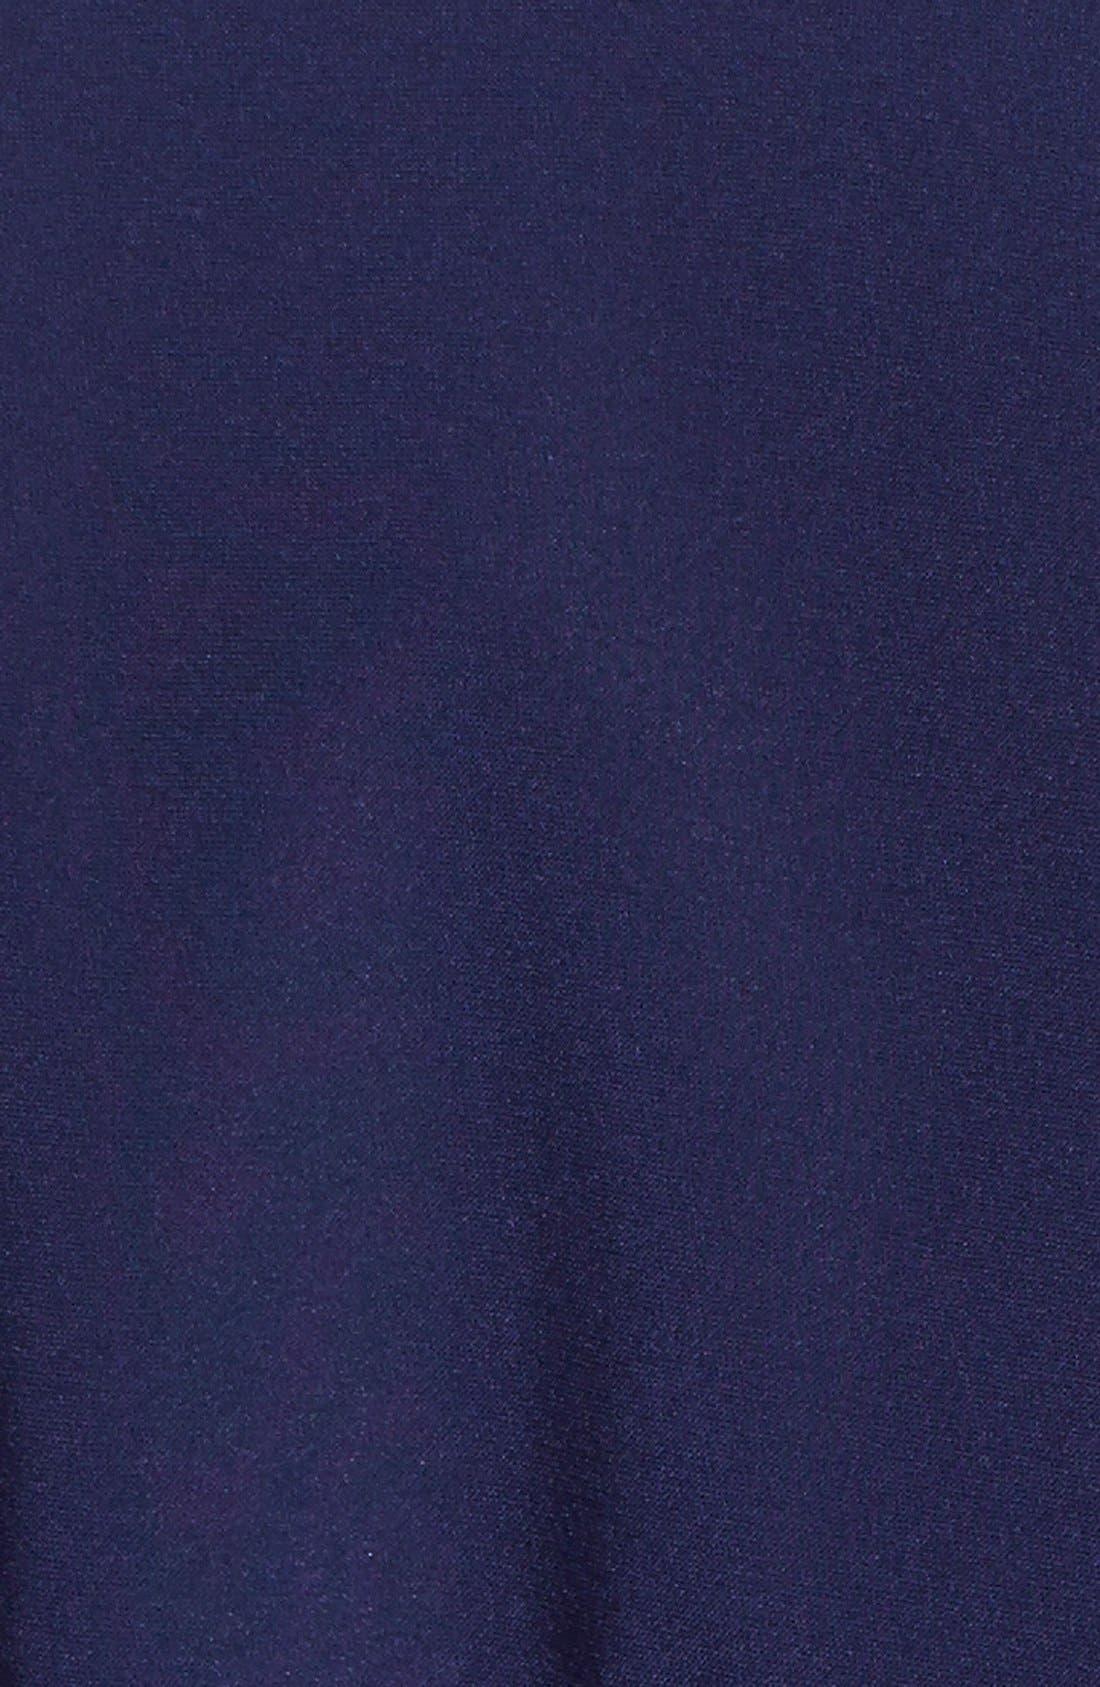 Alternate Image 3  - Zero + Maria Cornejo 'Edi' Stretch Silk Charmeuse Shirt